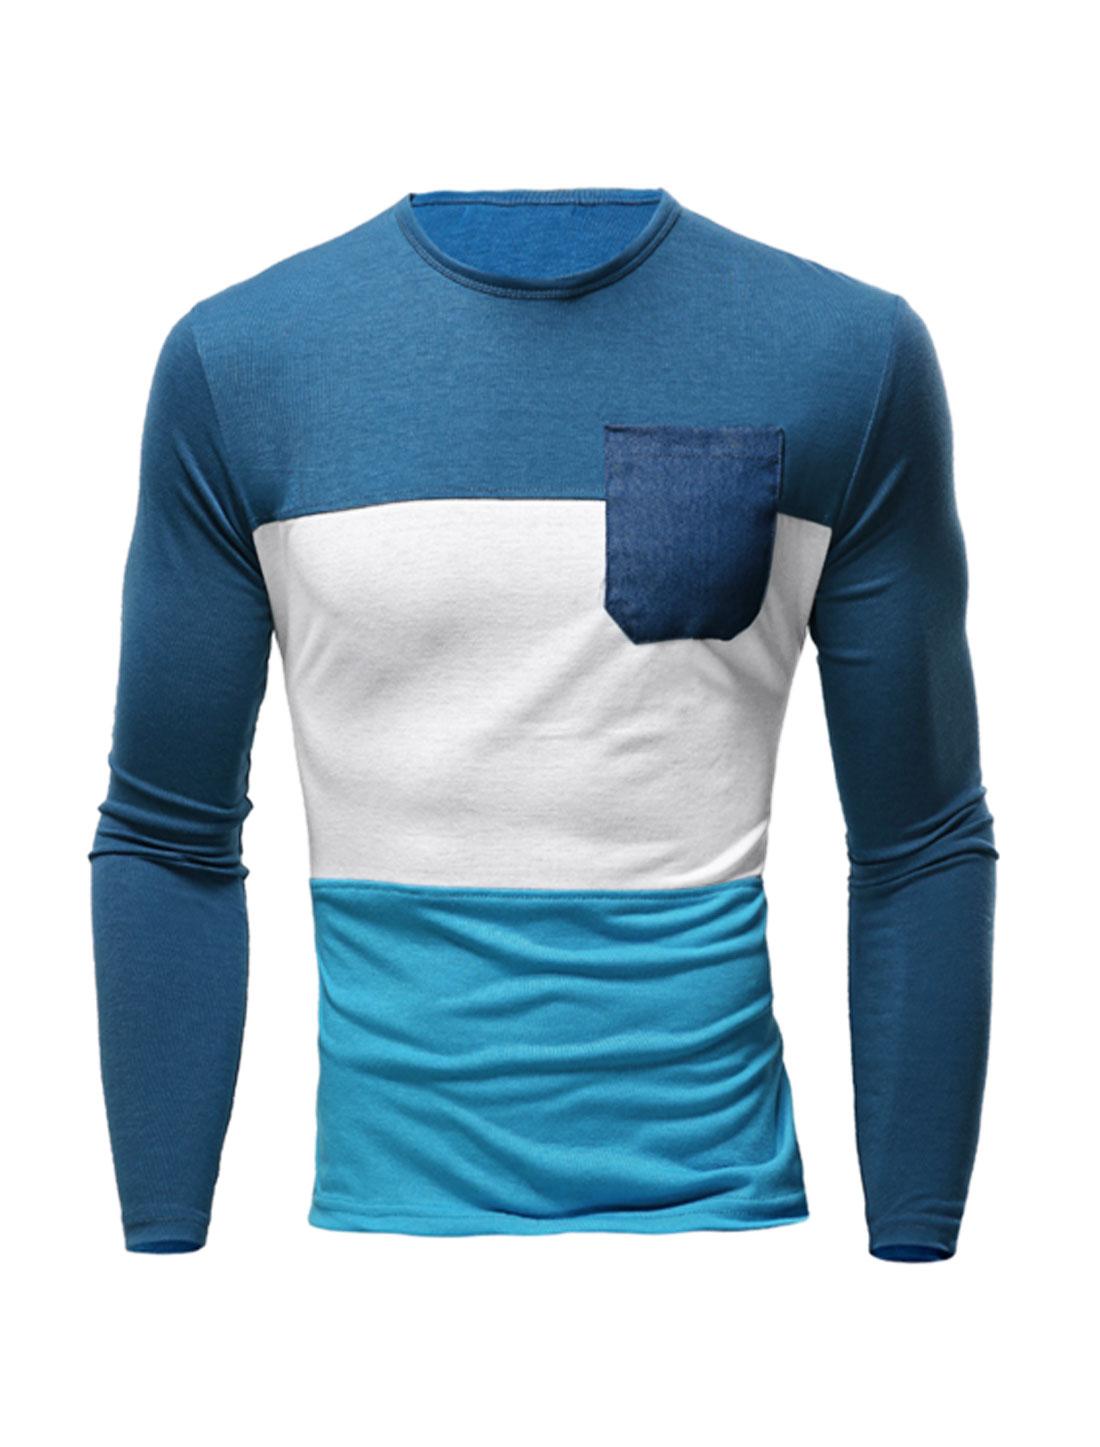 Men Long Sleeves Jean Panel Chest Pocket Color Block T-shirt Blue M